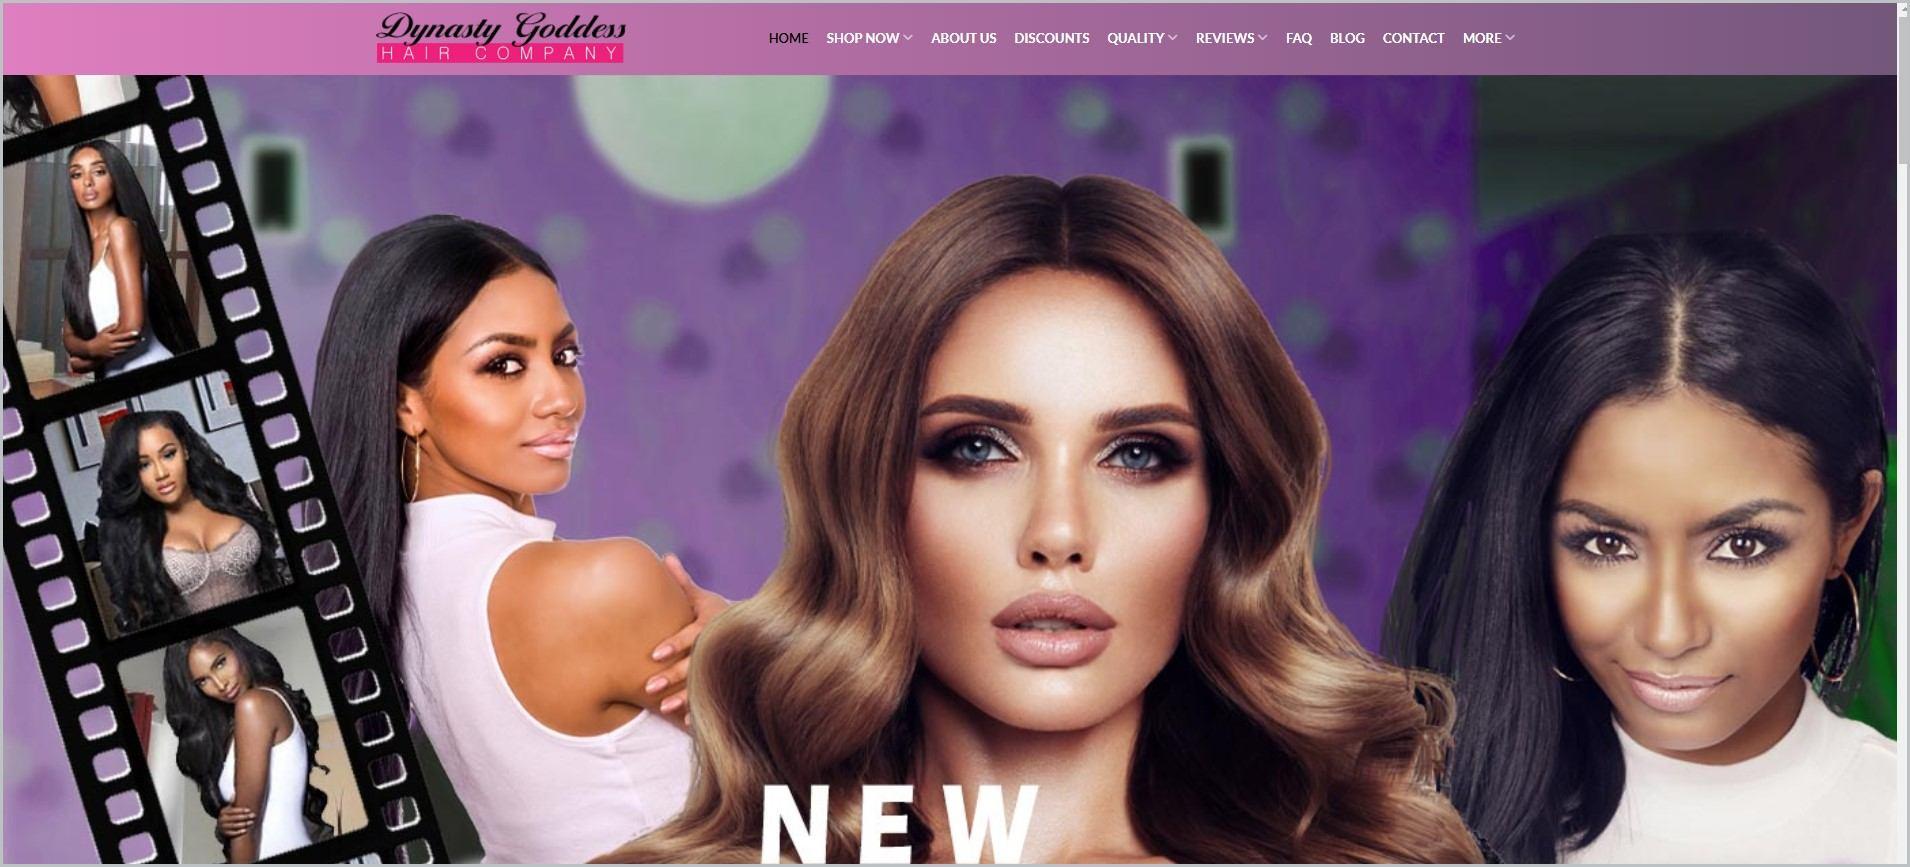 screenshot of Dynasty Goddess homepage,